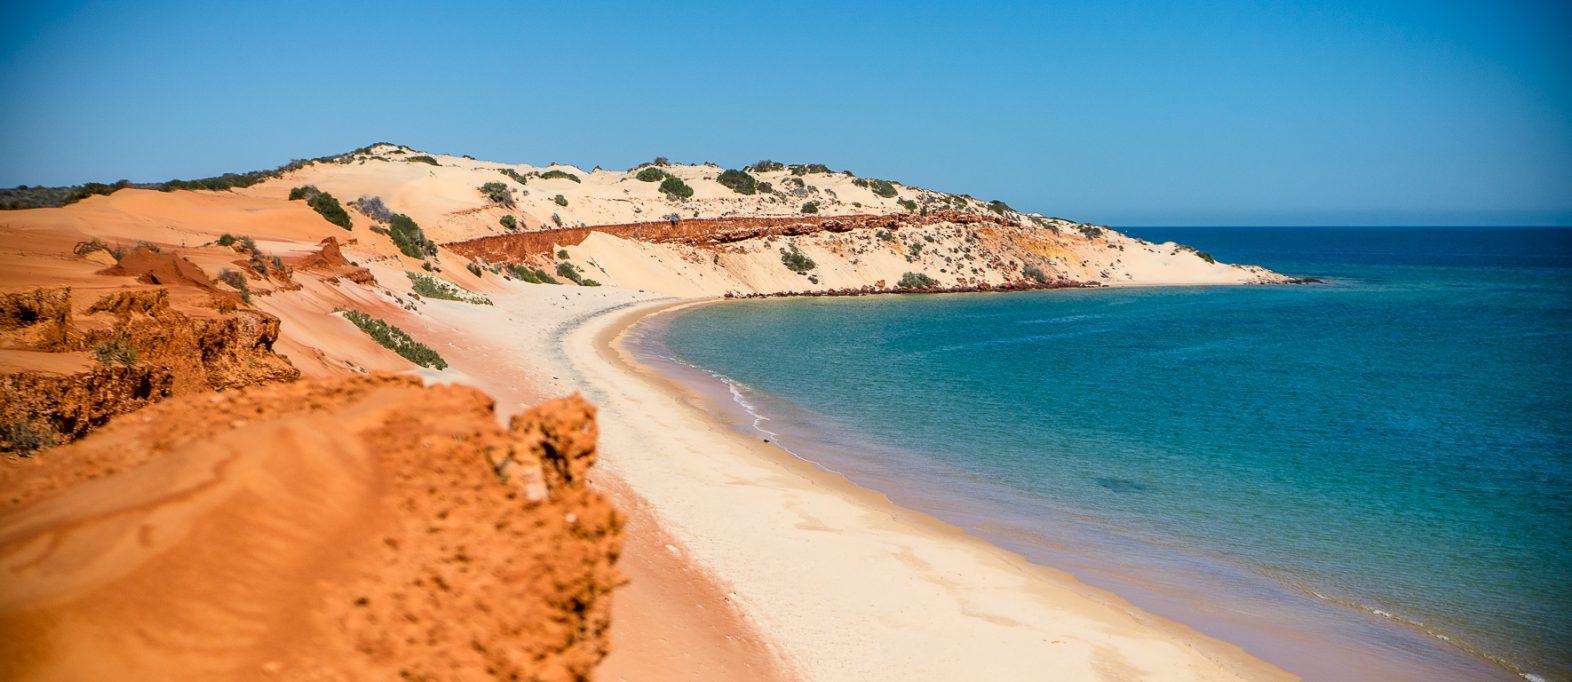 Reiseziele für Urlaub im Mai